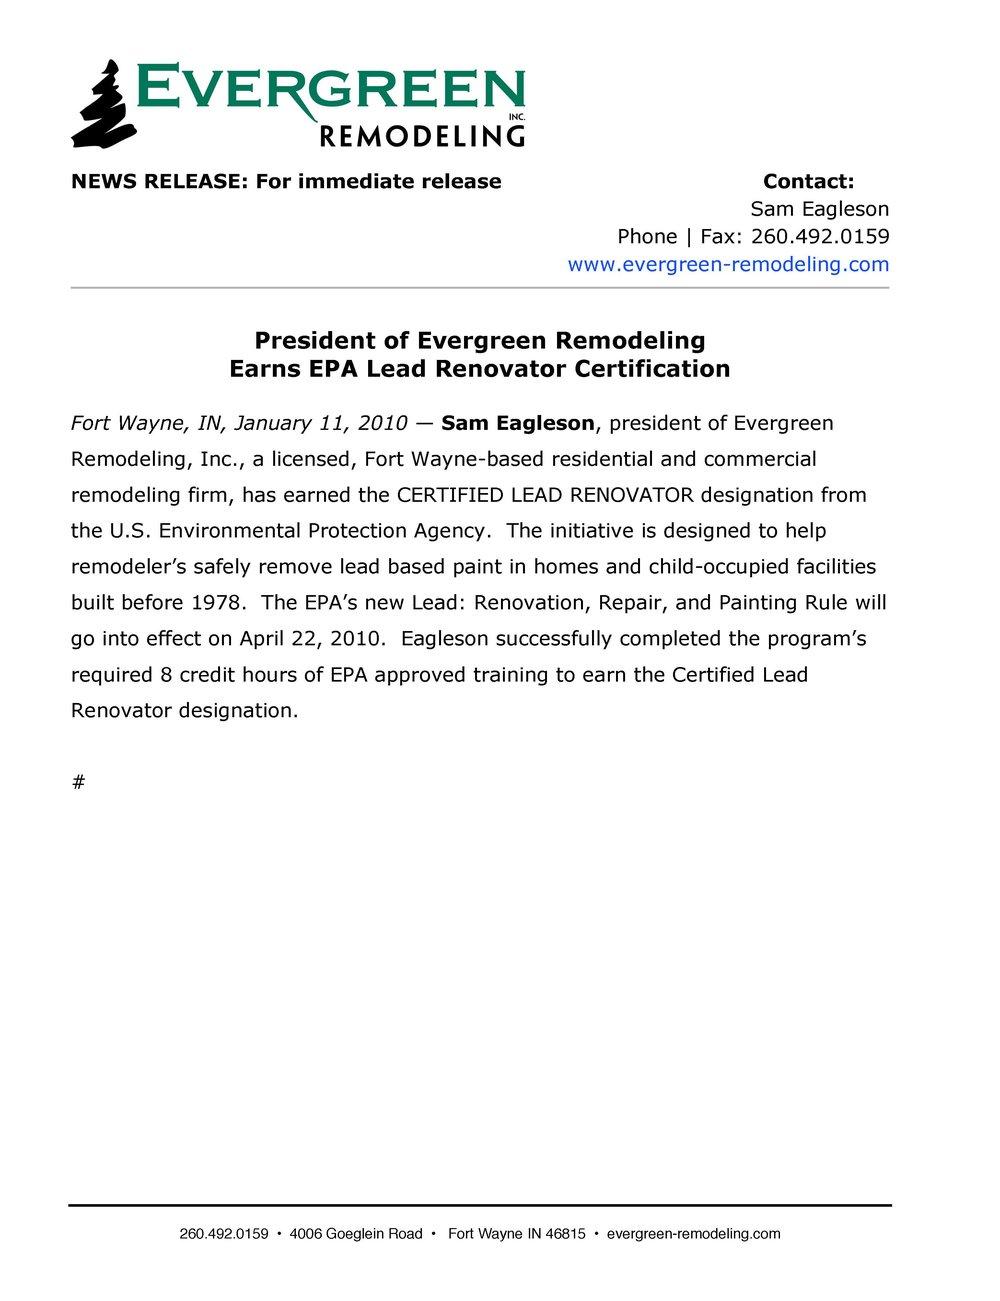 President Of Evergreen Remodeling Earns Epa Lead Renovator